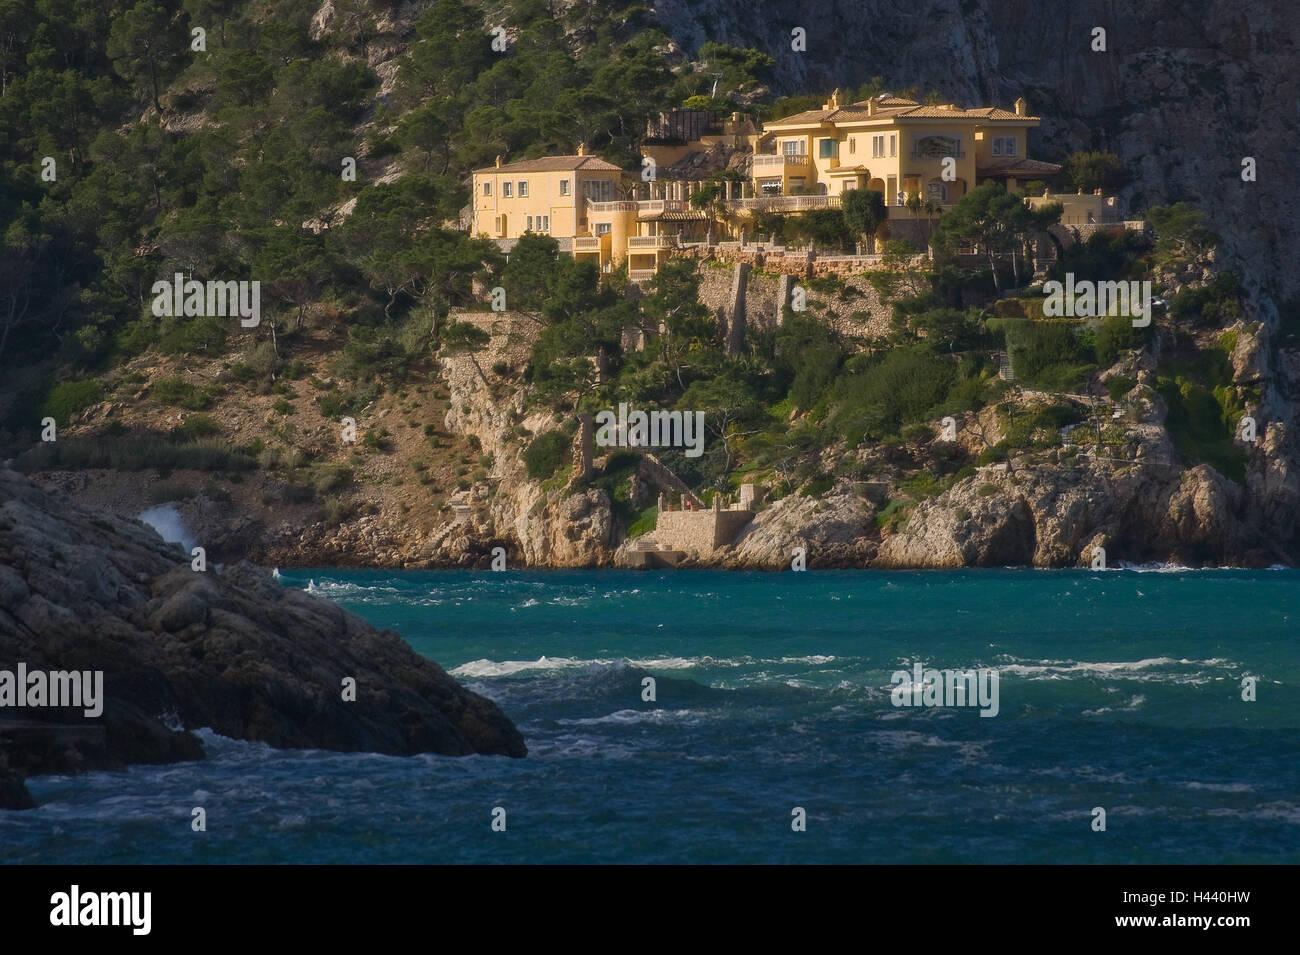 Spain, Majorca, Badia de Andratx, bile coast, villa, the Balearic Islands, Balearic Islands island, coast, steep - Stock Image